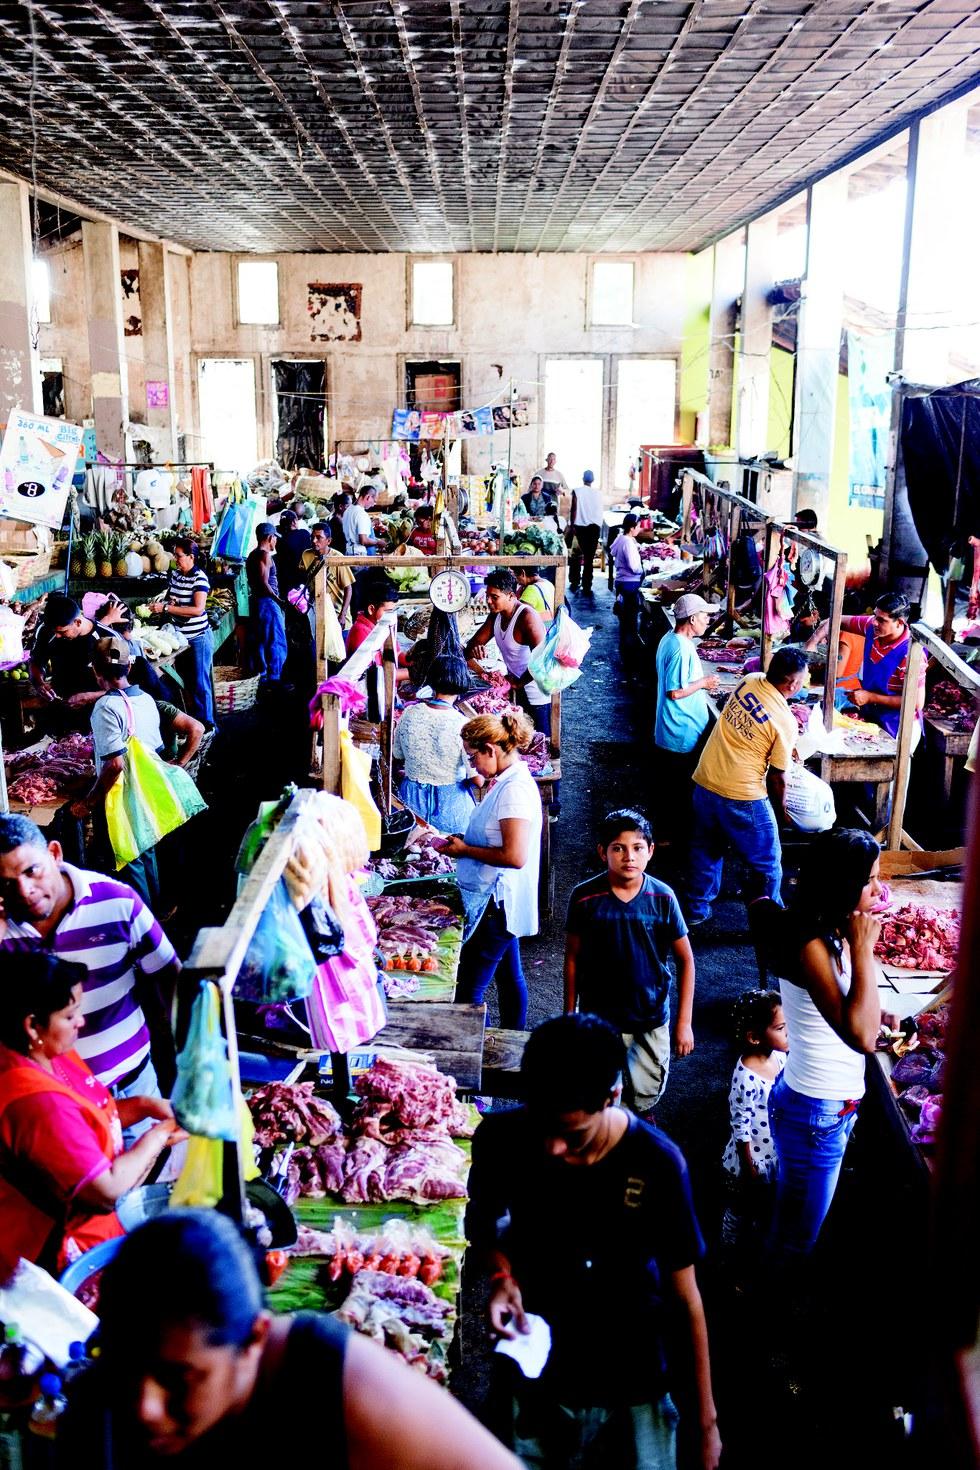 Busy market stalls